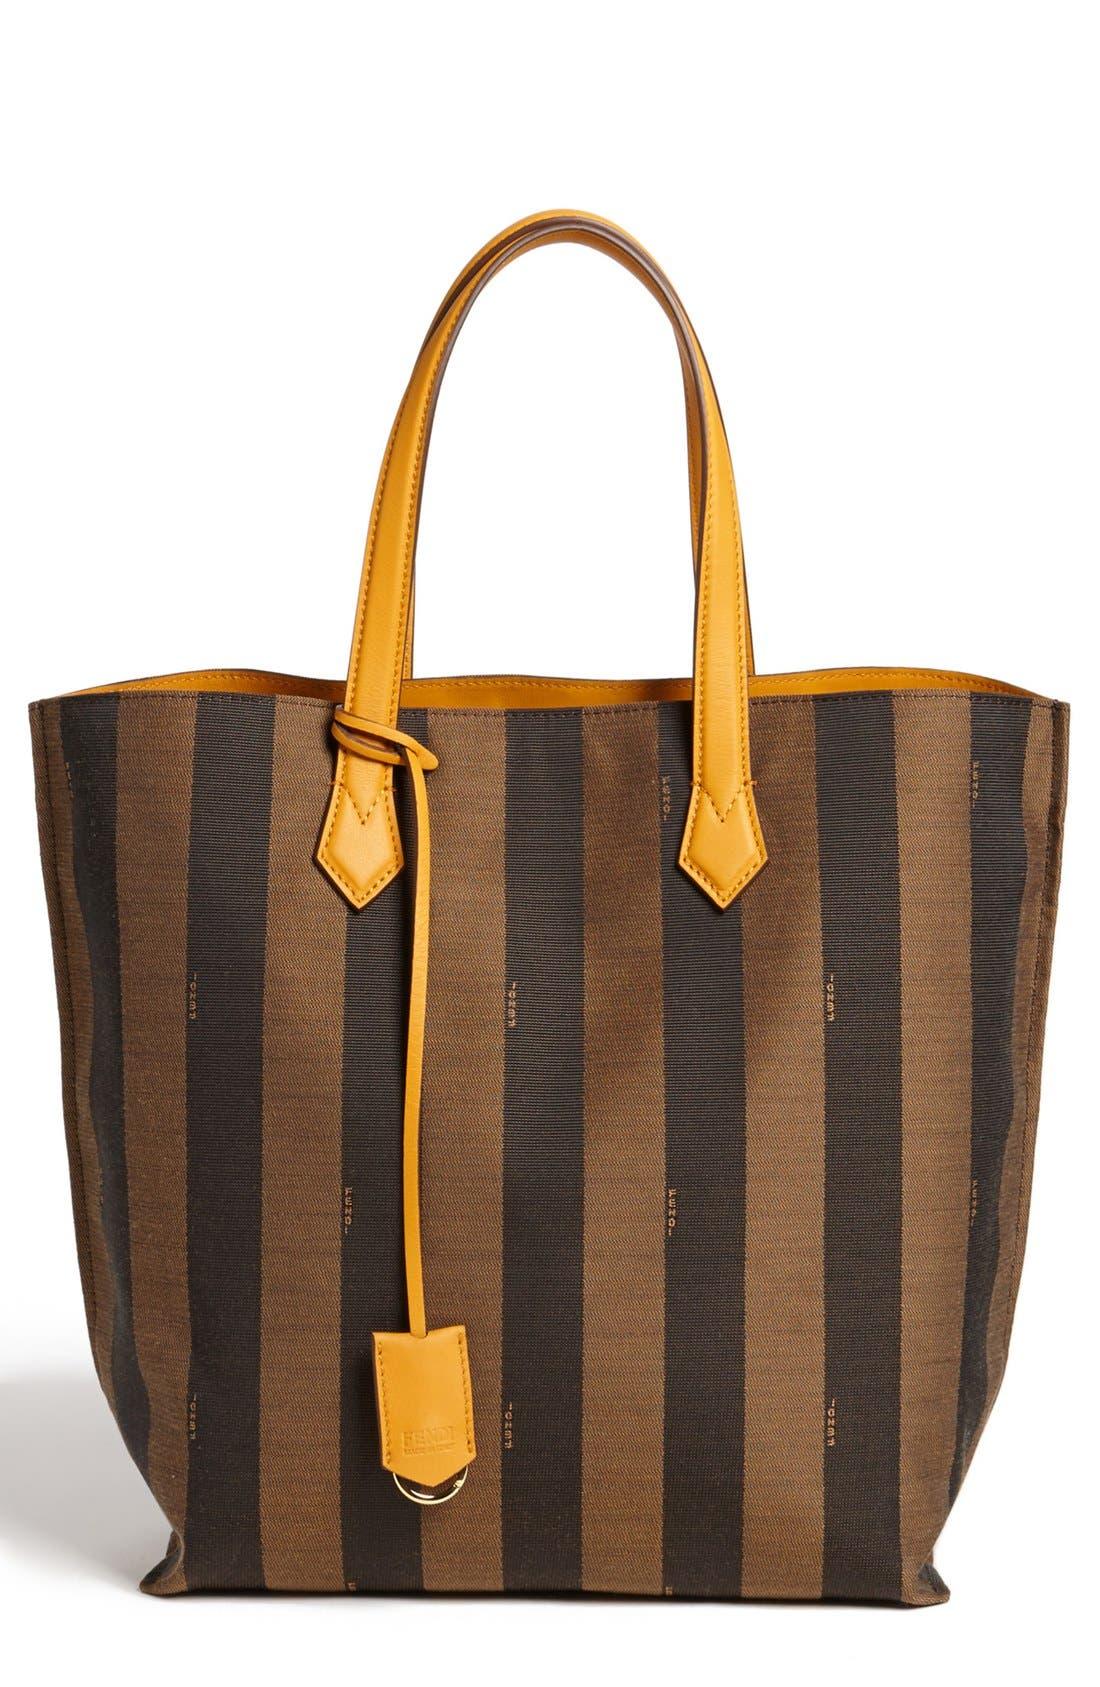 Main Image - Fendi 'All In - Pequin' Logo Jacquard Shopper Tote